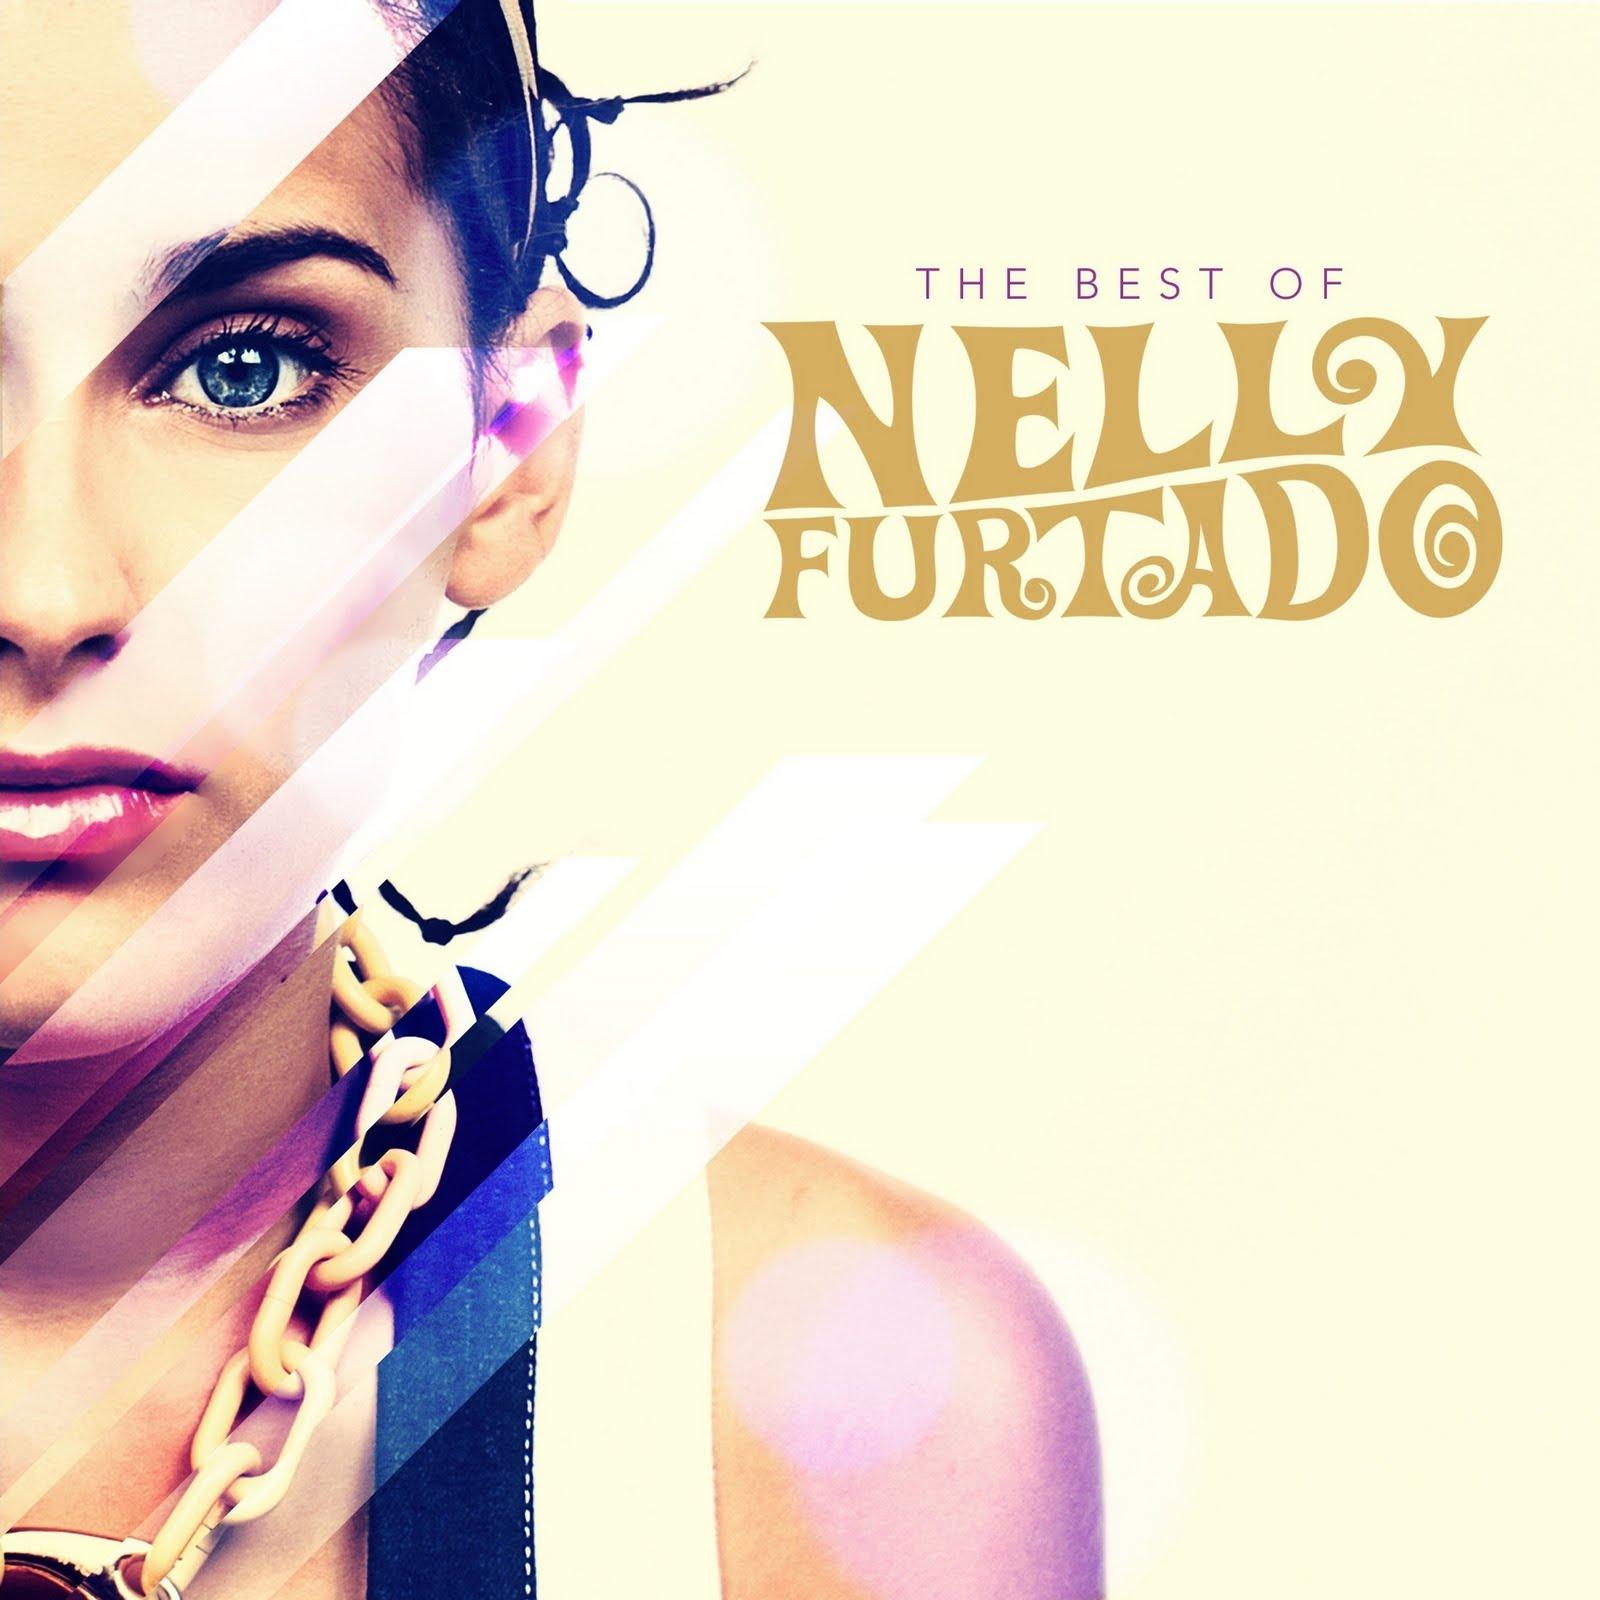 http://4.bp.blogspot.com/_bq9TcMaVMGw/TRjgfYYz9AI/AAAAAAAAE-I/HxNhjBkrbaE/s1600/The+best+of+Nelly+Furtado.jpg